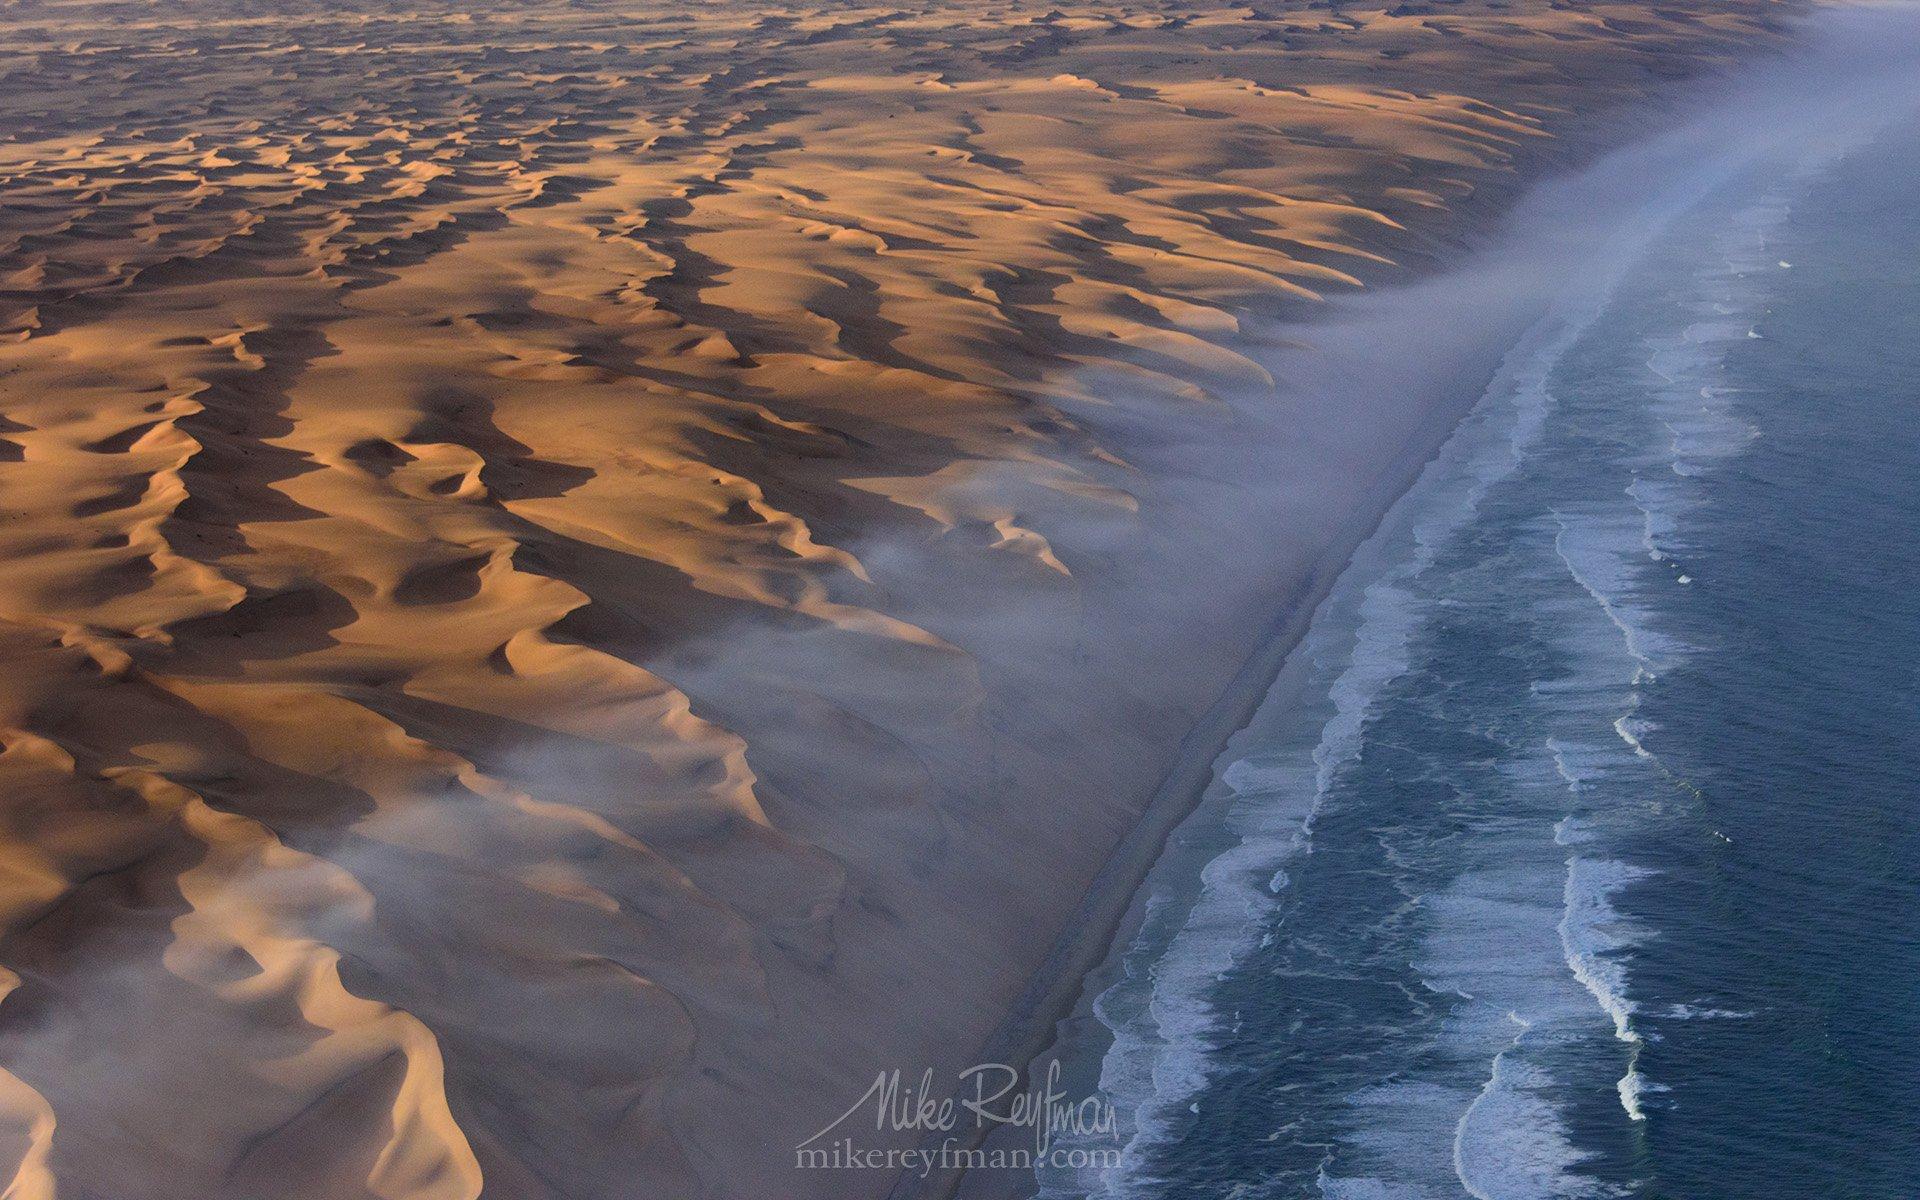 sea, sunset, water, nature, beach, travel,  ocean,  sand, wave, surf, seashore, outdoors,   no person, fair weather, nature, namibia, desert, africa, beauty, adventure, backgrounds, aerial view, arid climate, skeleton coast, namib desert, Майк Рейфман